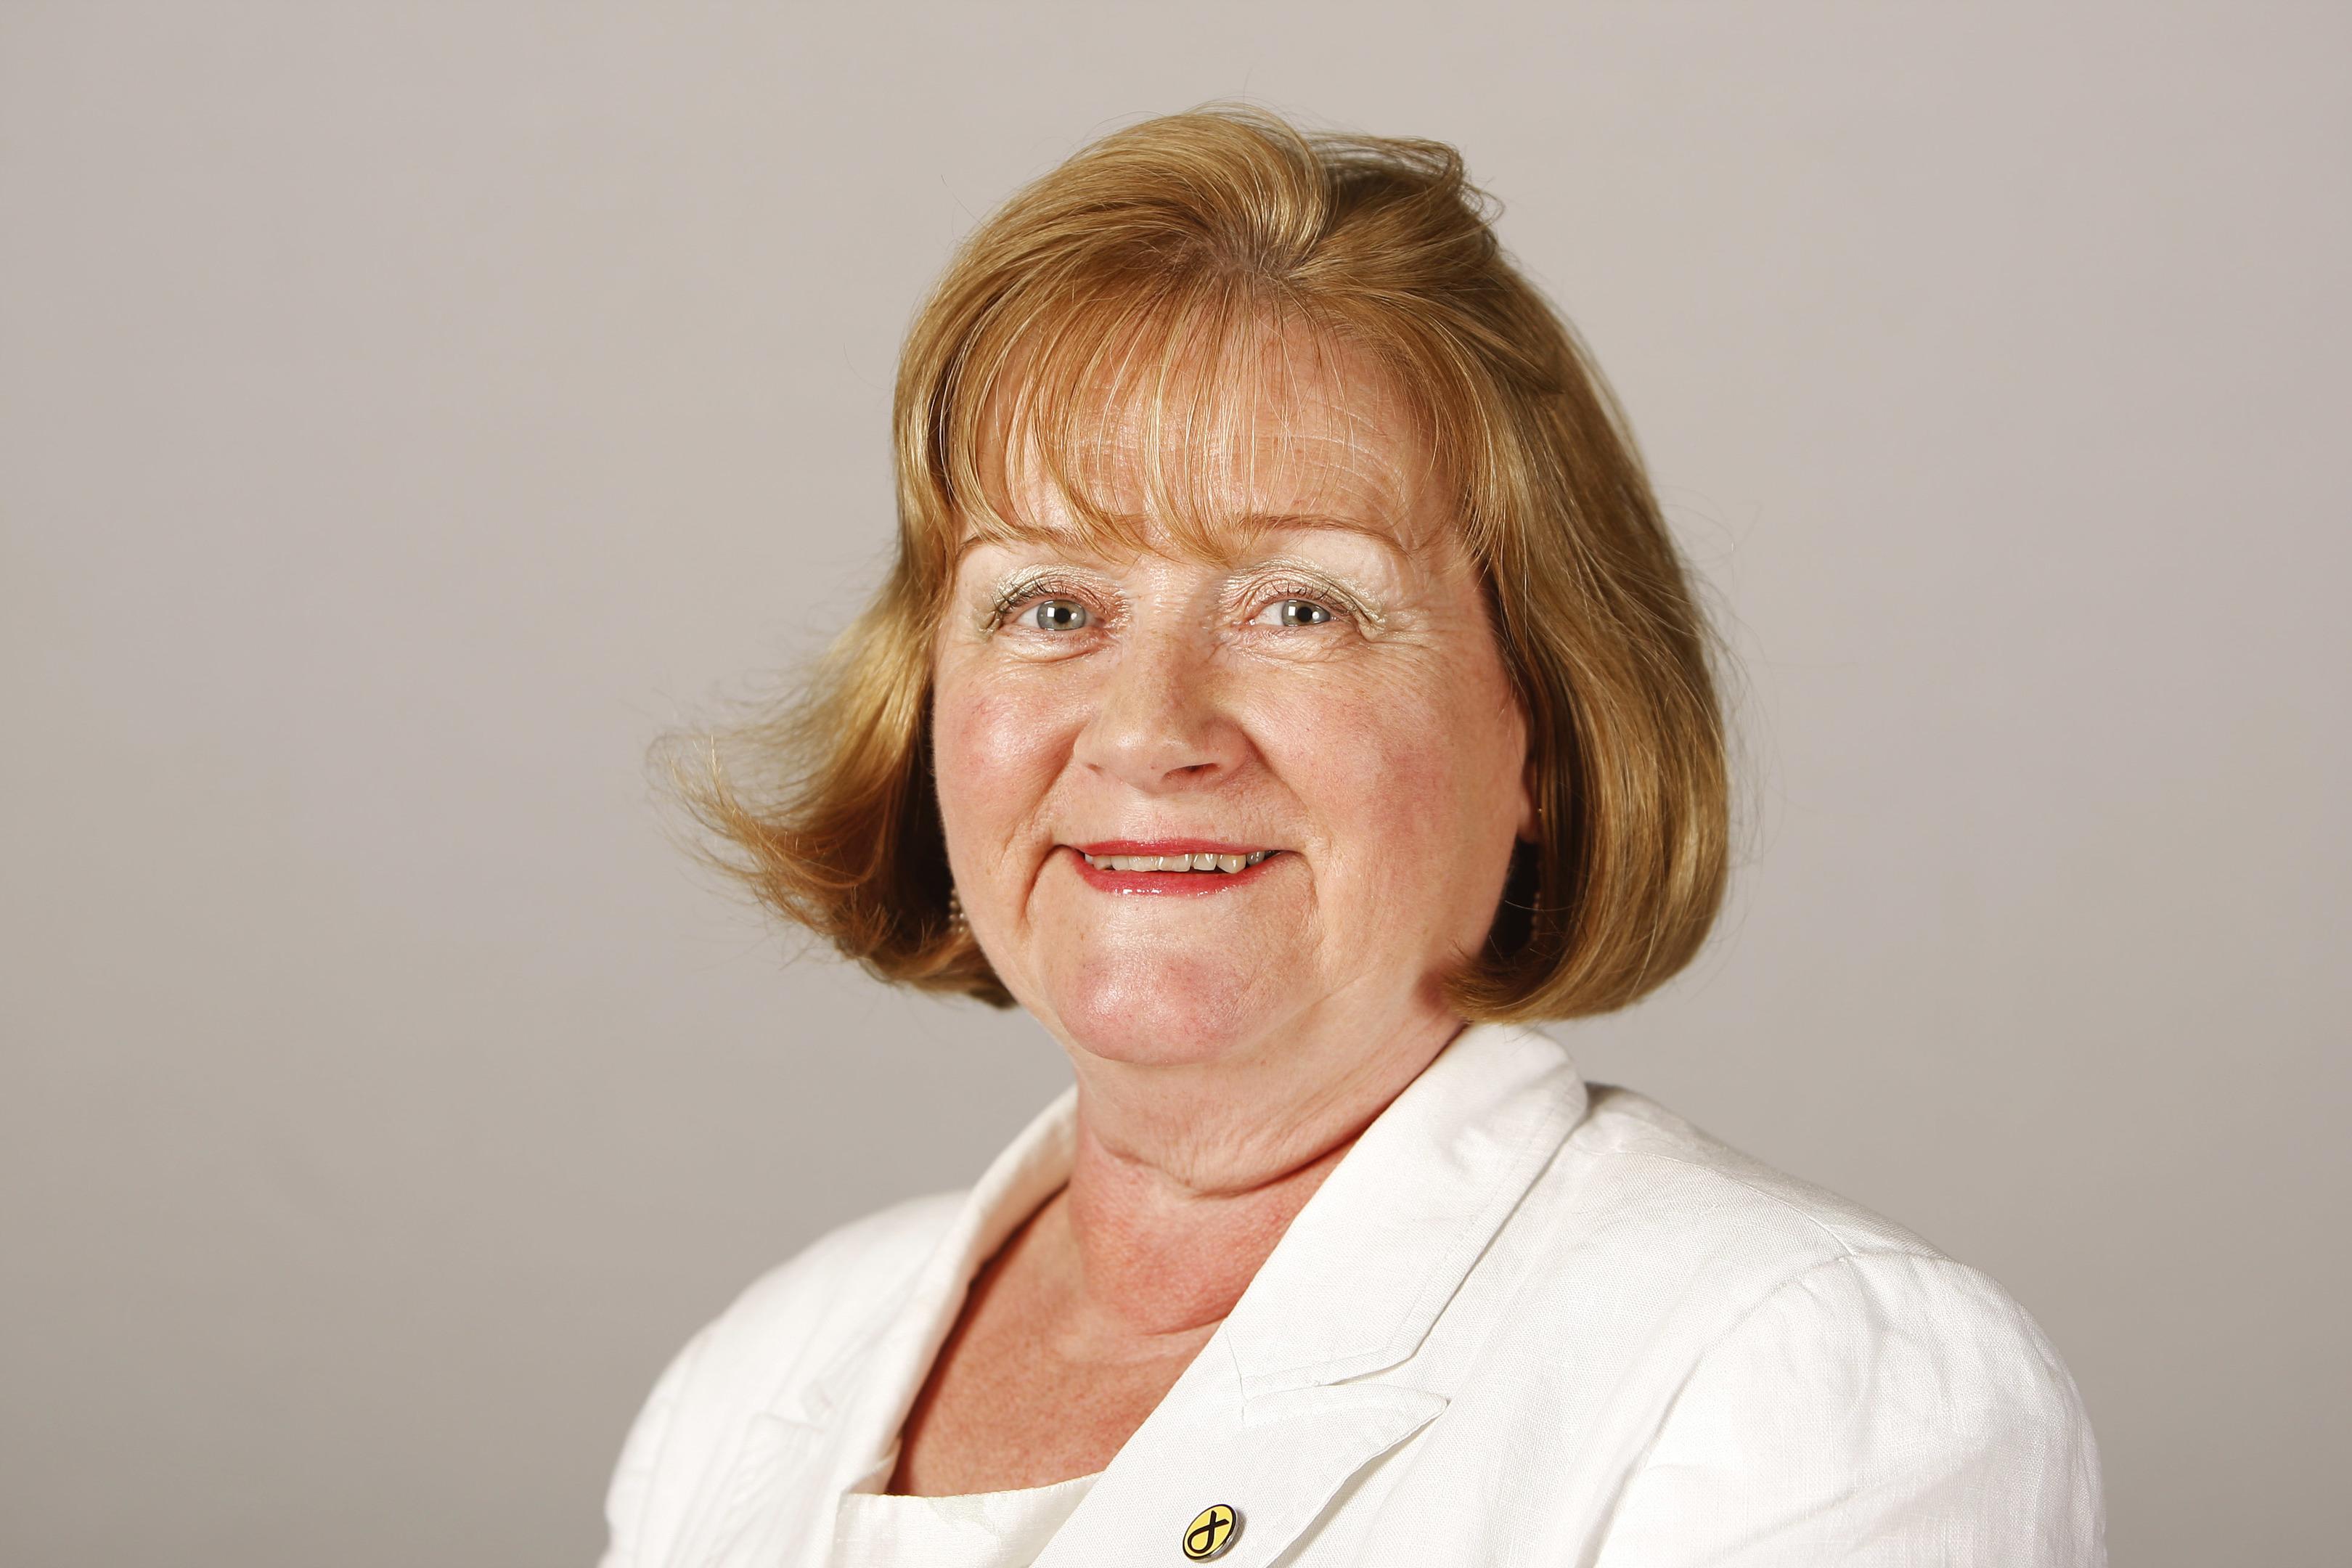 Maureen Watt, Minister for Mental Health (Andrew Cowan/Scottish Parliament)